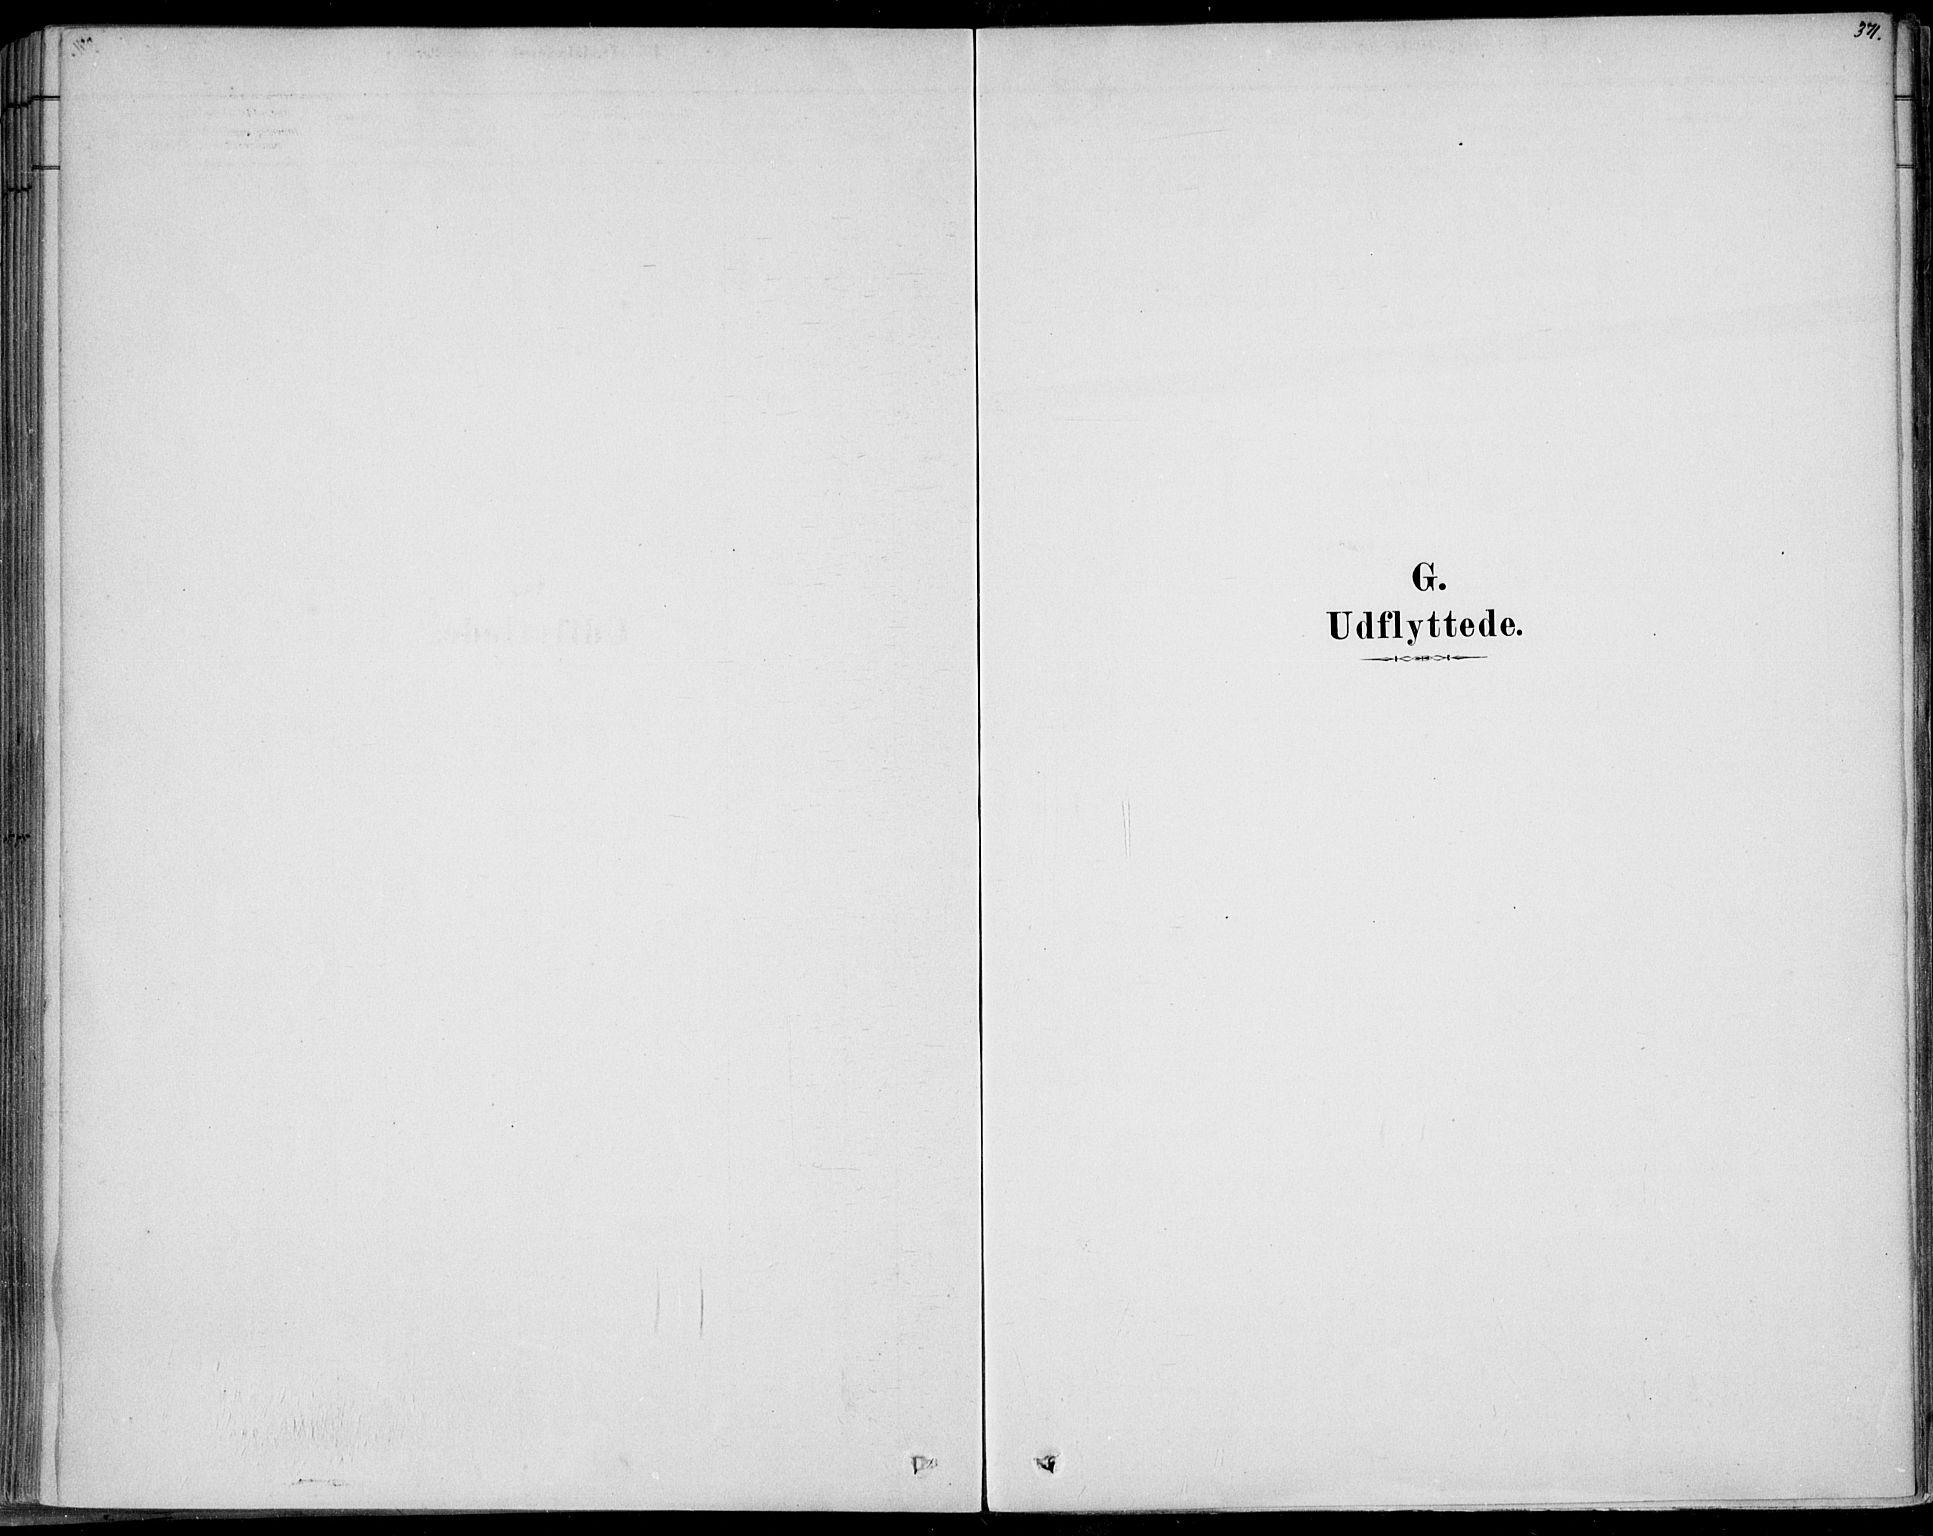 SAKO, Sem kirkebøker, F/Fb/L0004: Parish register (official) no. II 4, 1878-1891, p. 371